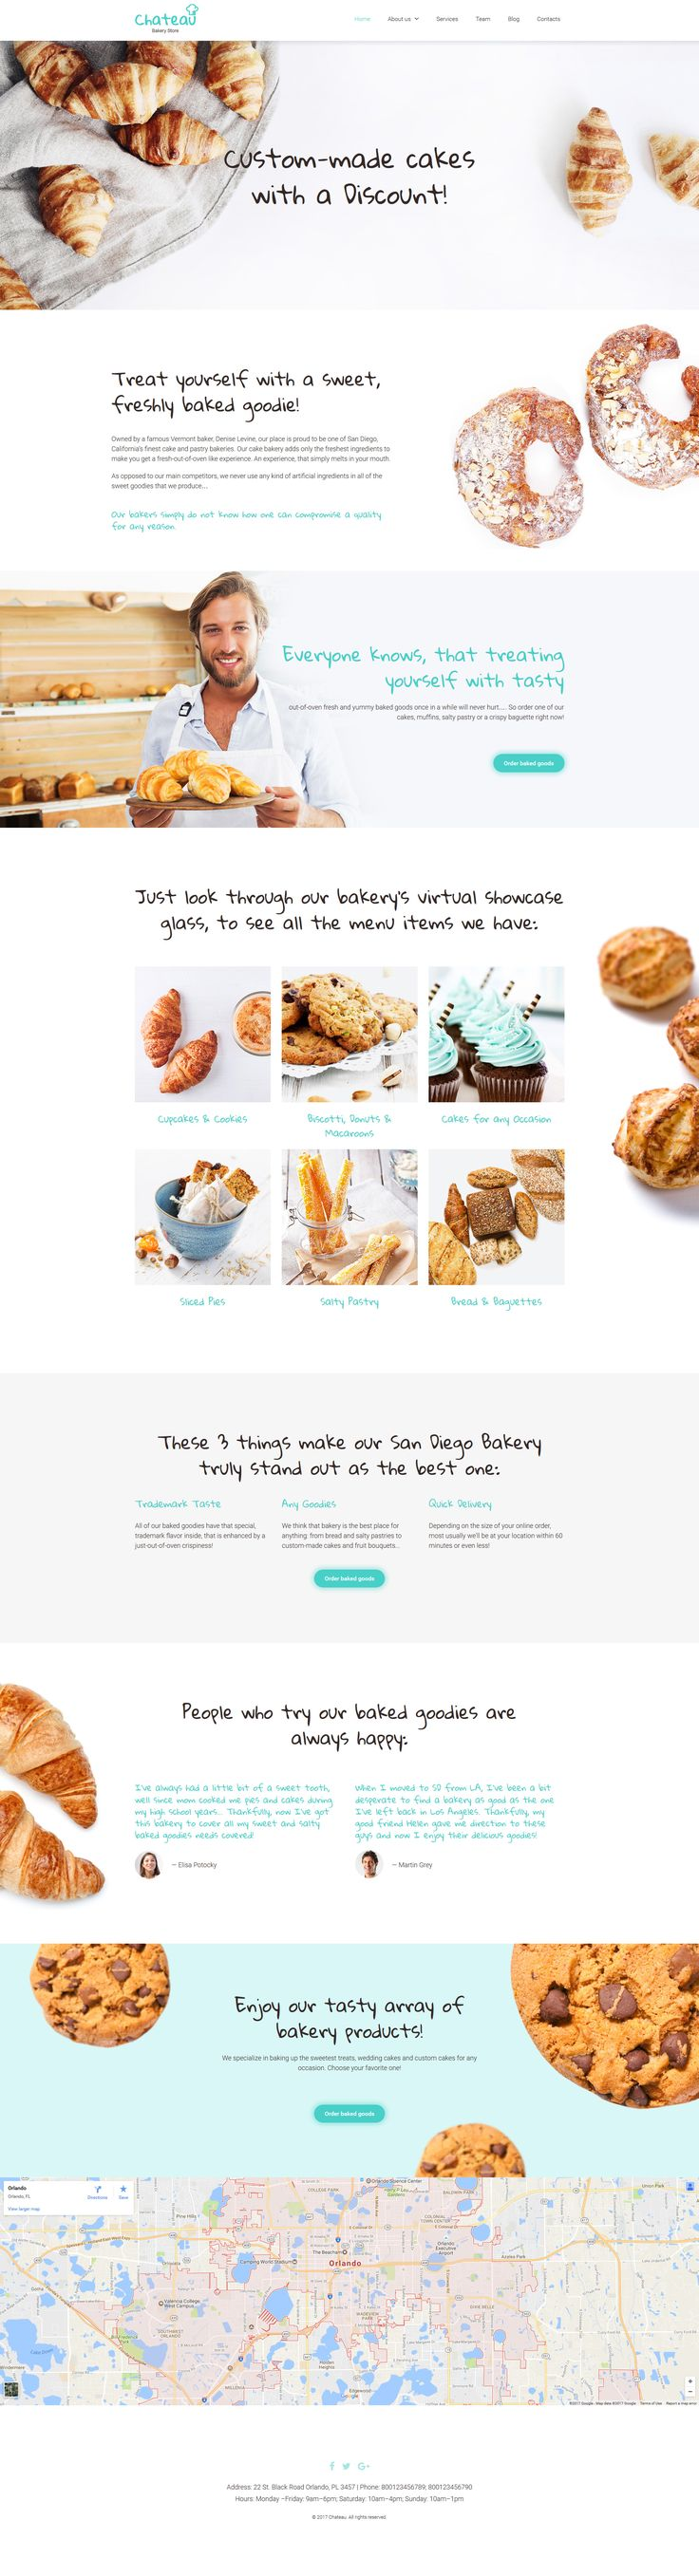 Bakery Responsive Moto CMS 3 Template - https://www.templatemonster.com/moto-cms-3-templates/bakery-responsive-moto-cms-3-template-59429.html